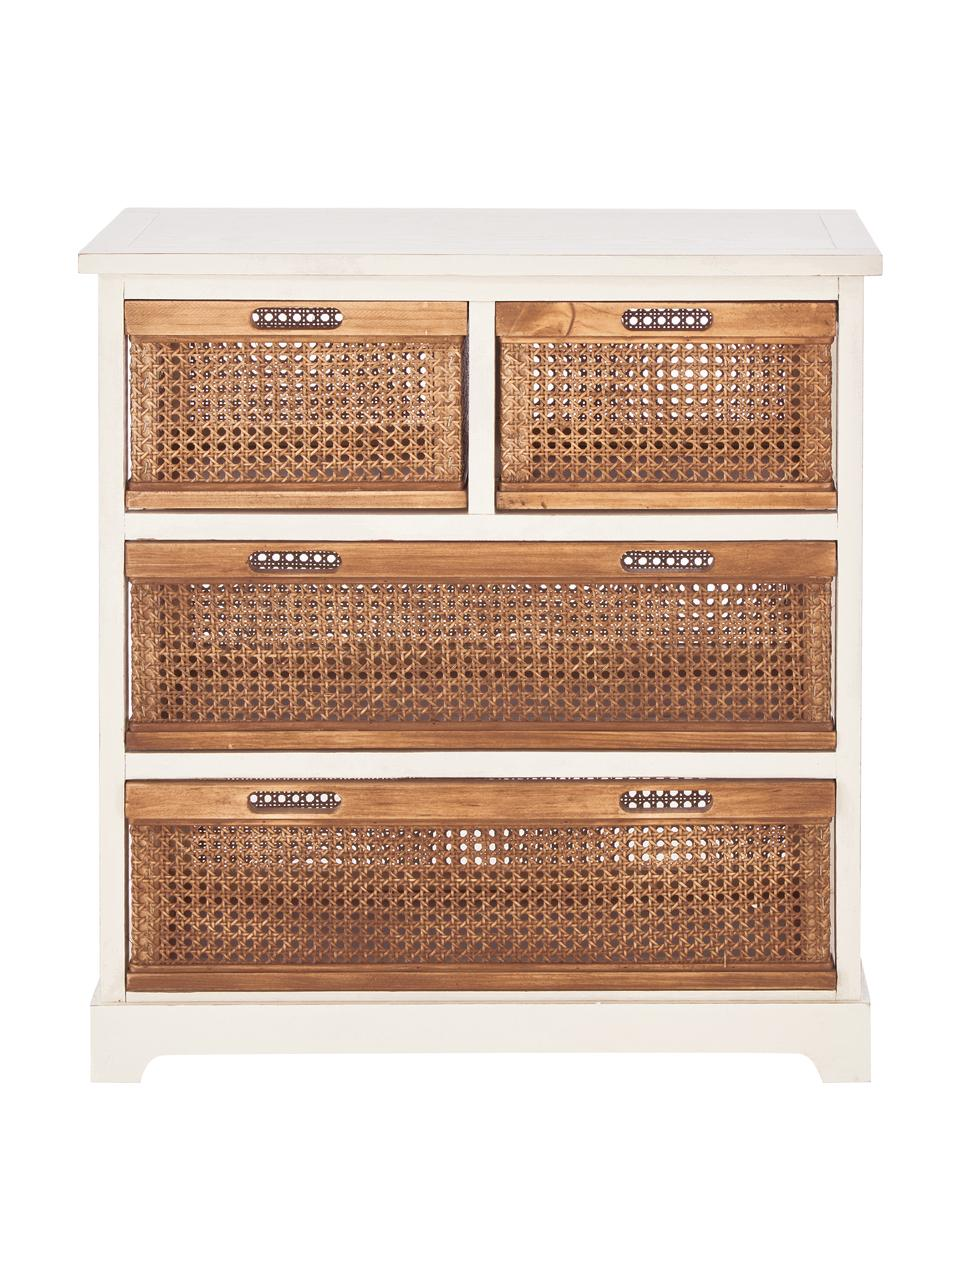 Cassettiera in legno e rattan Bantu, Bianco crema, marrone, Larg. 74 x Alt. 77 cm